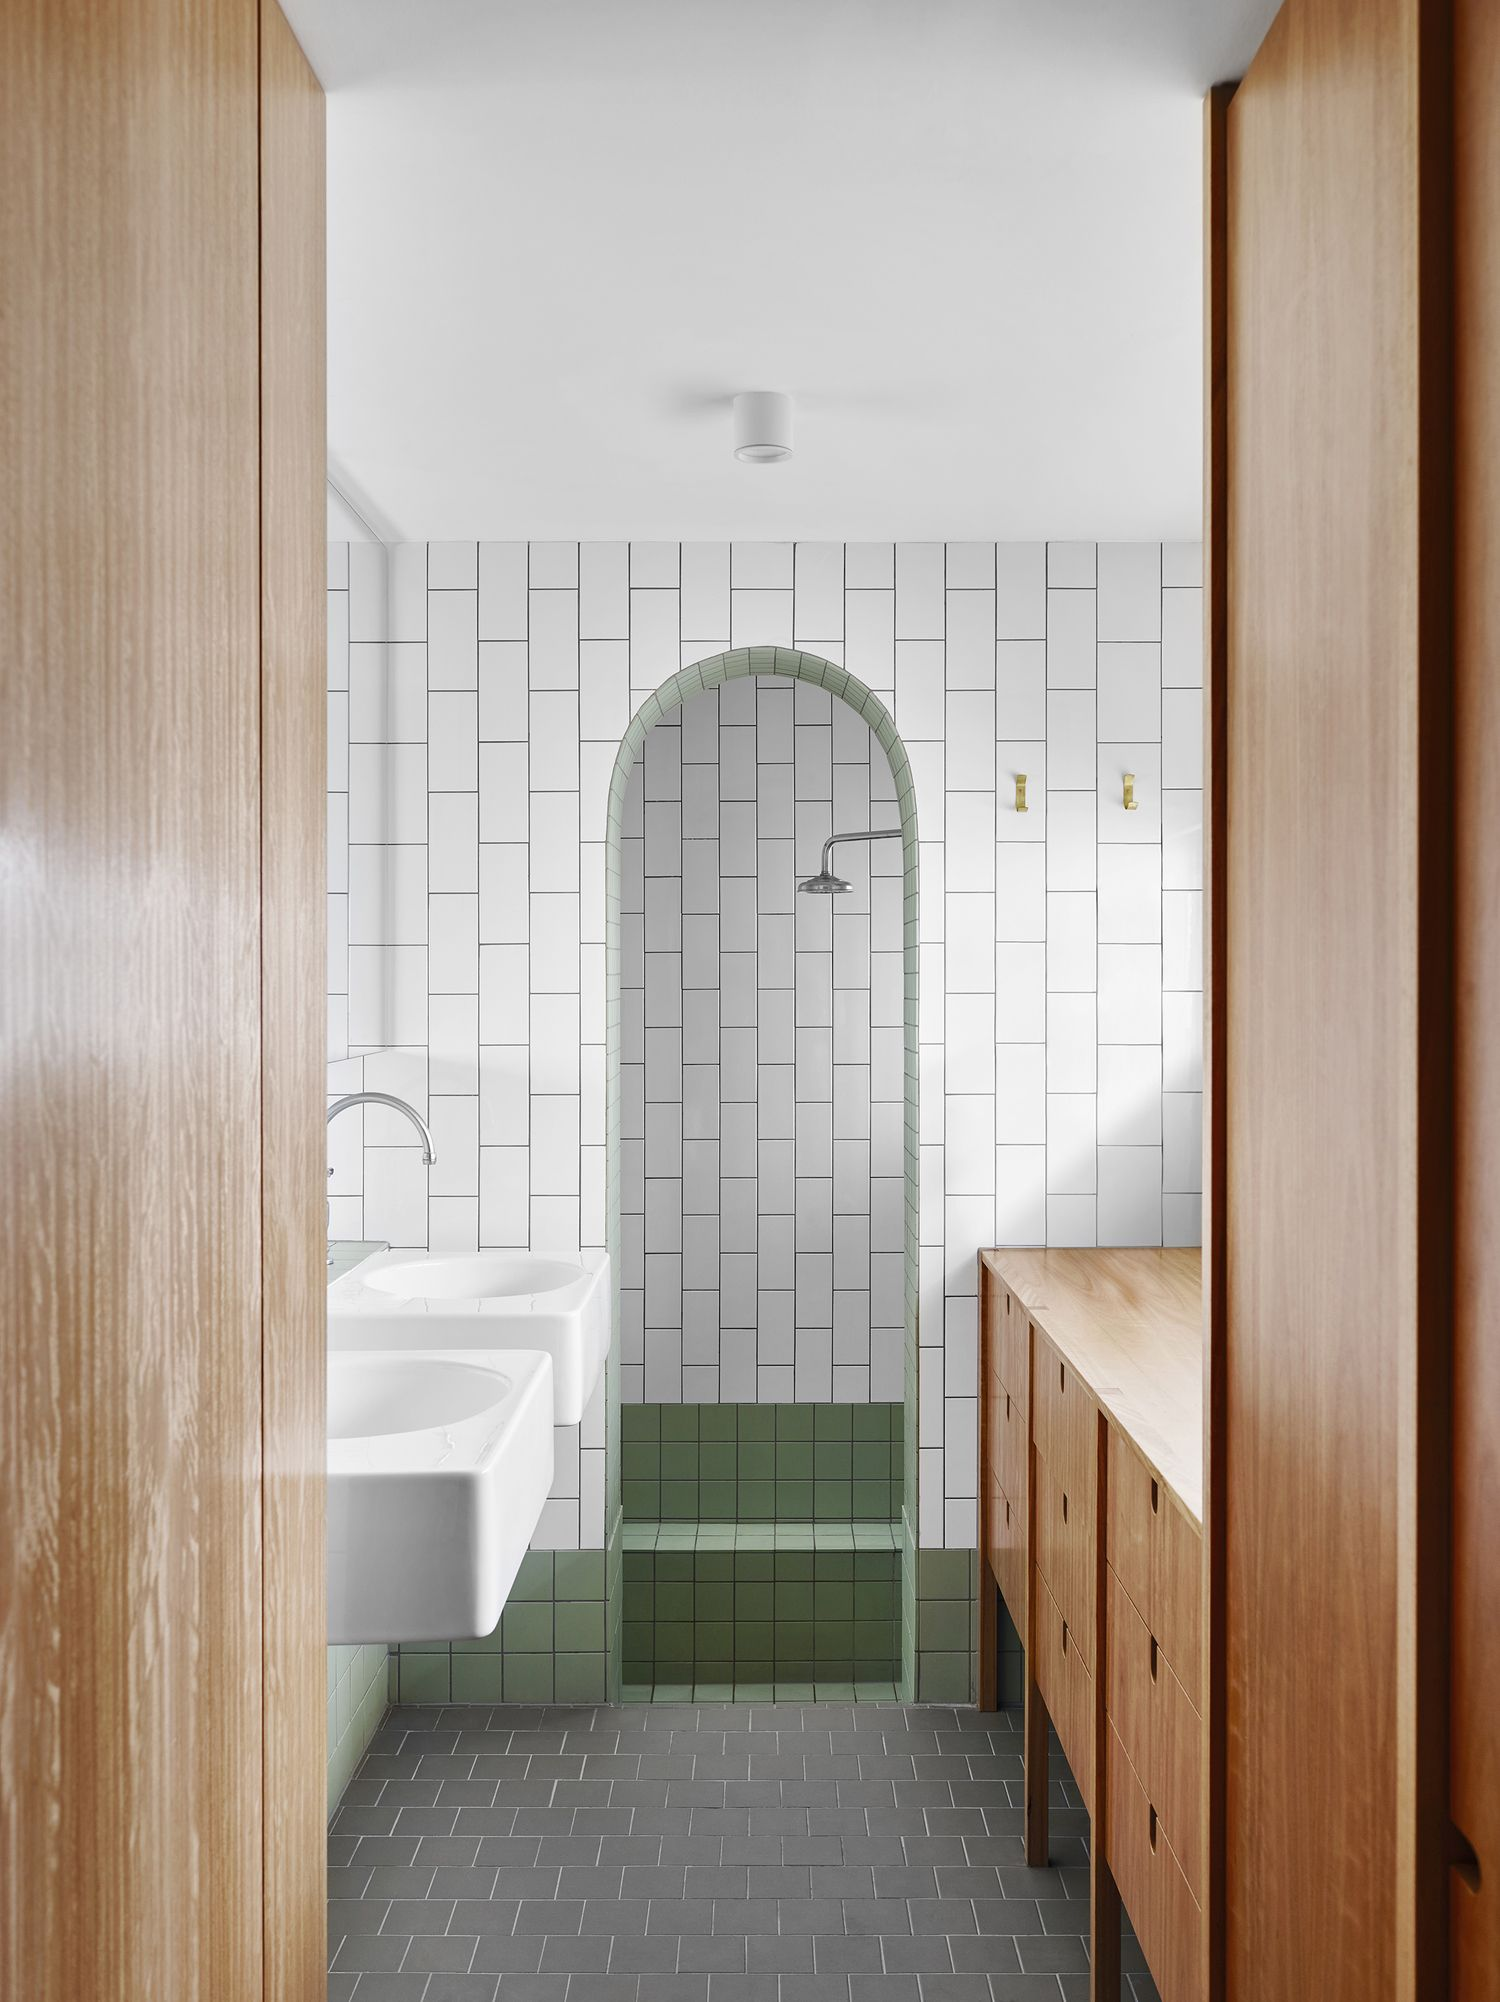 CF036995©TobyScott.jpg | Bathroom | Pinterest | Bath, Interiors and ...